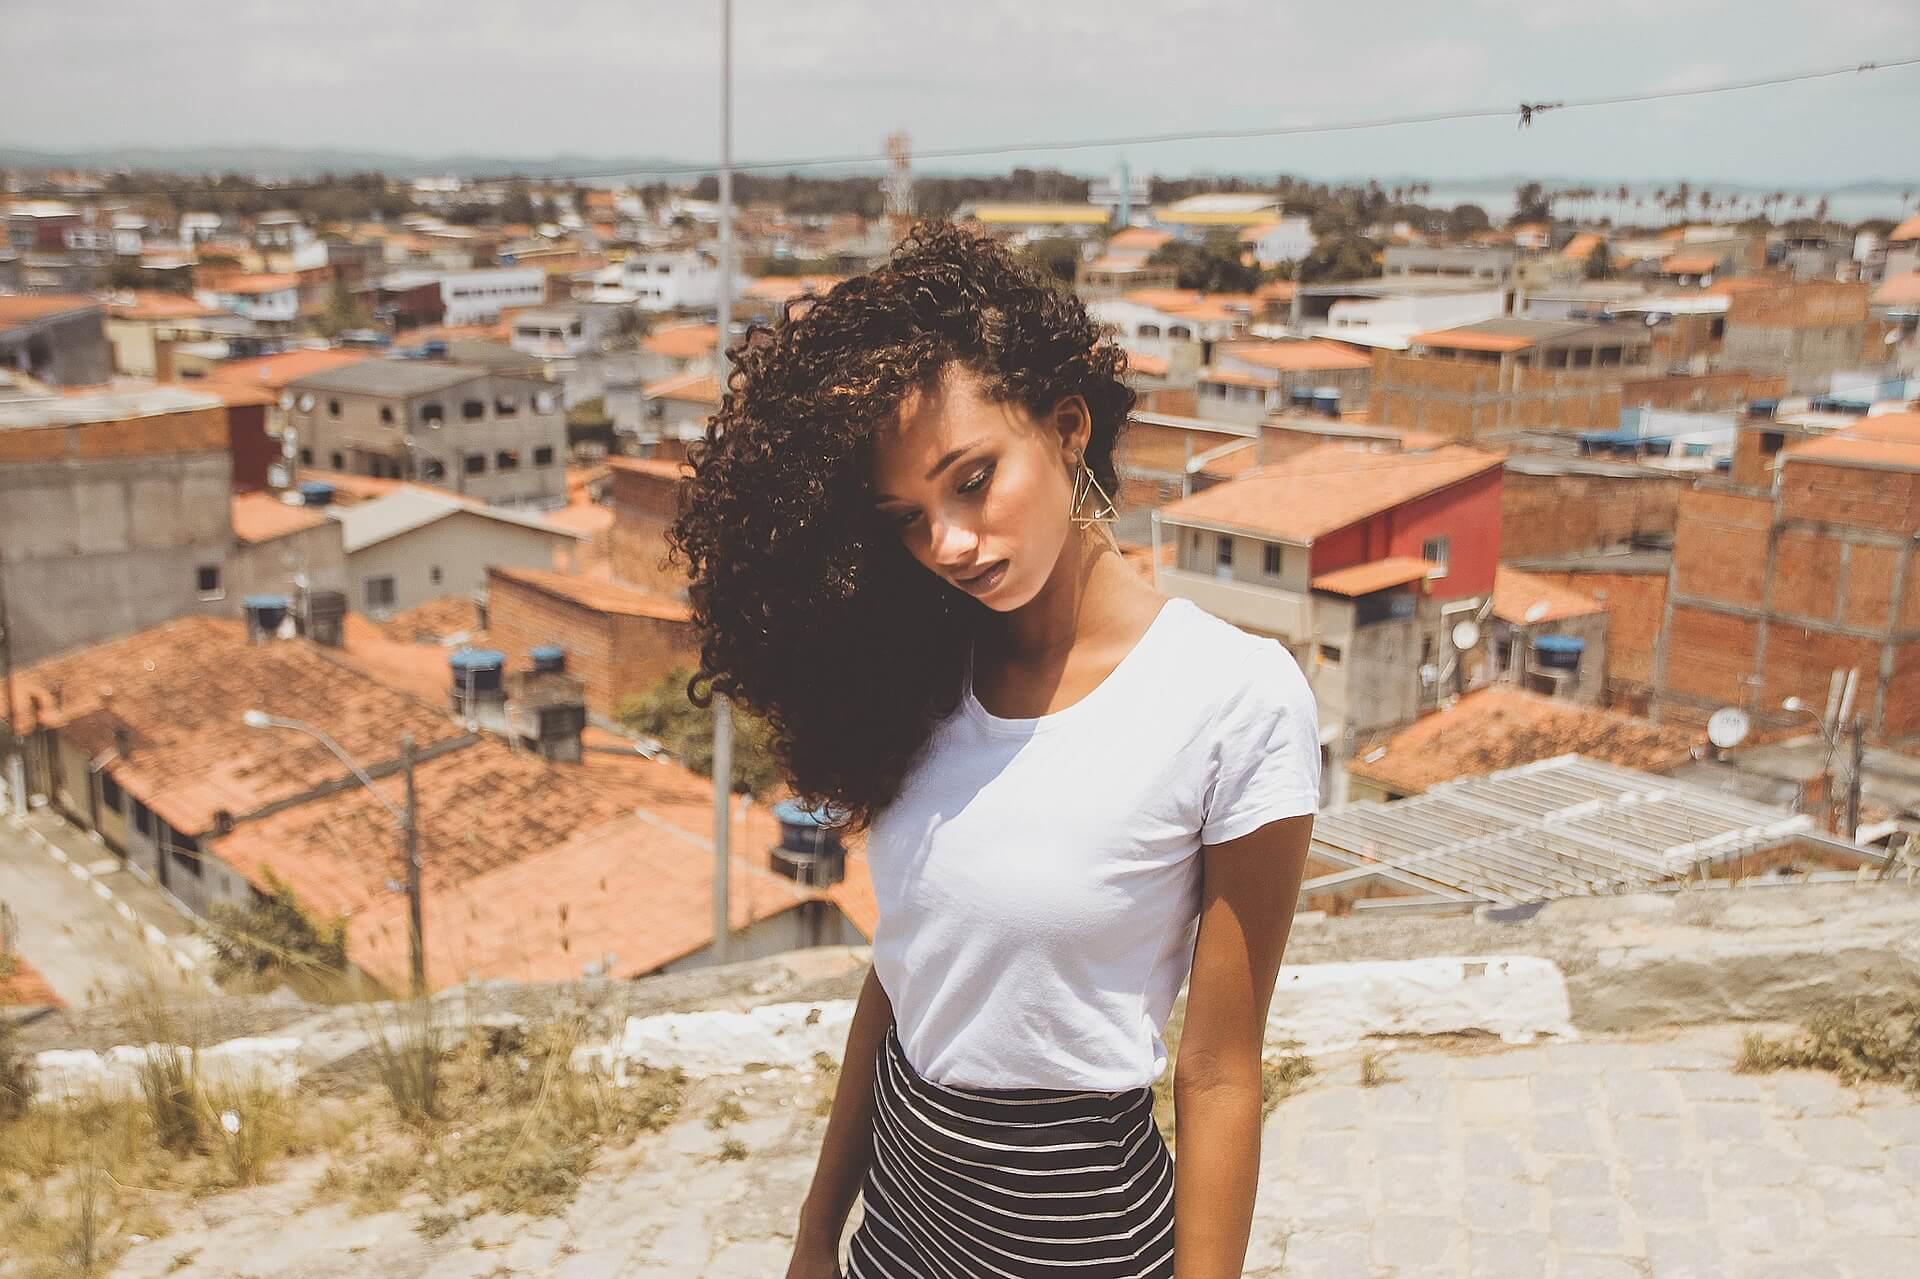 How to find Brazilian Girls in Brazil